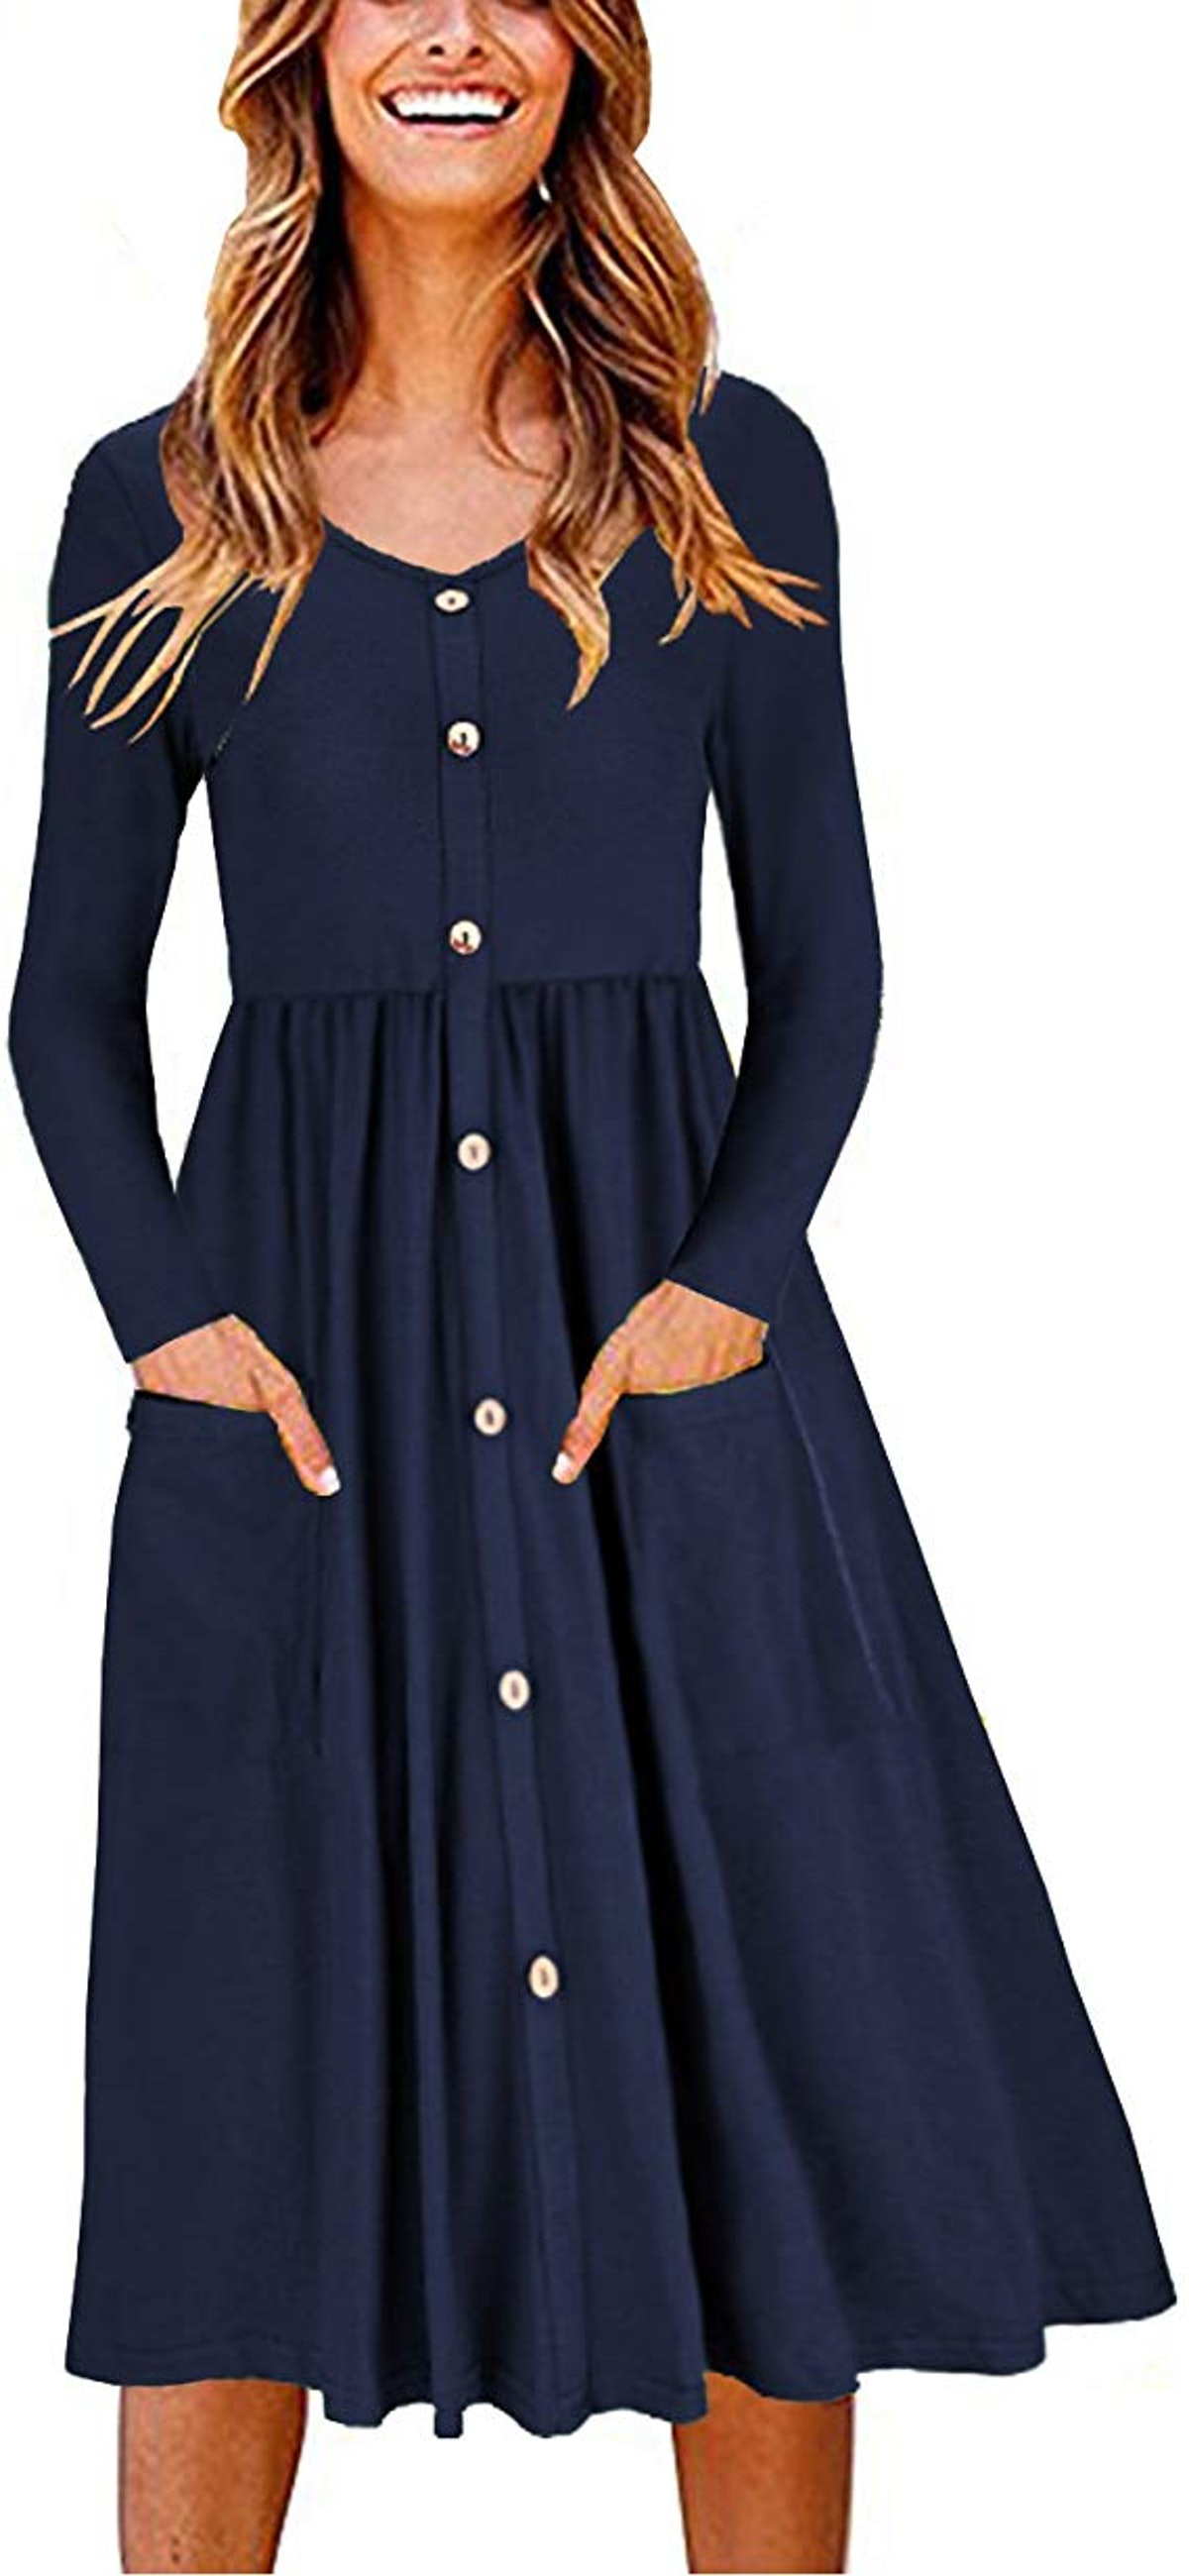 OUGES Women's Long Sleeve Skater Dress